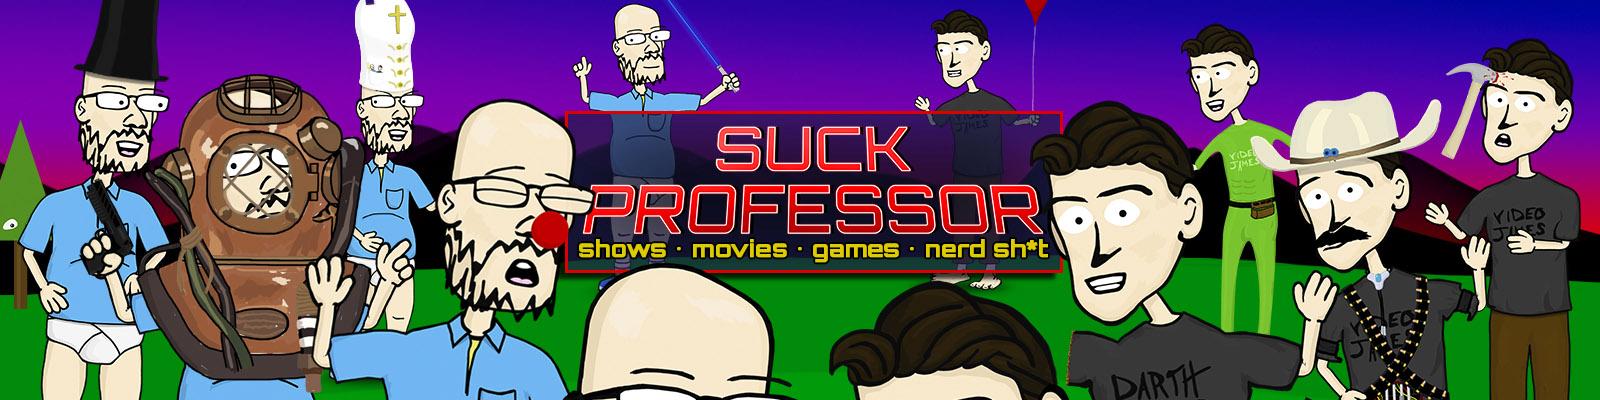 SuckProfessor YouTube channel banner artwork featuring Hank and James